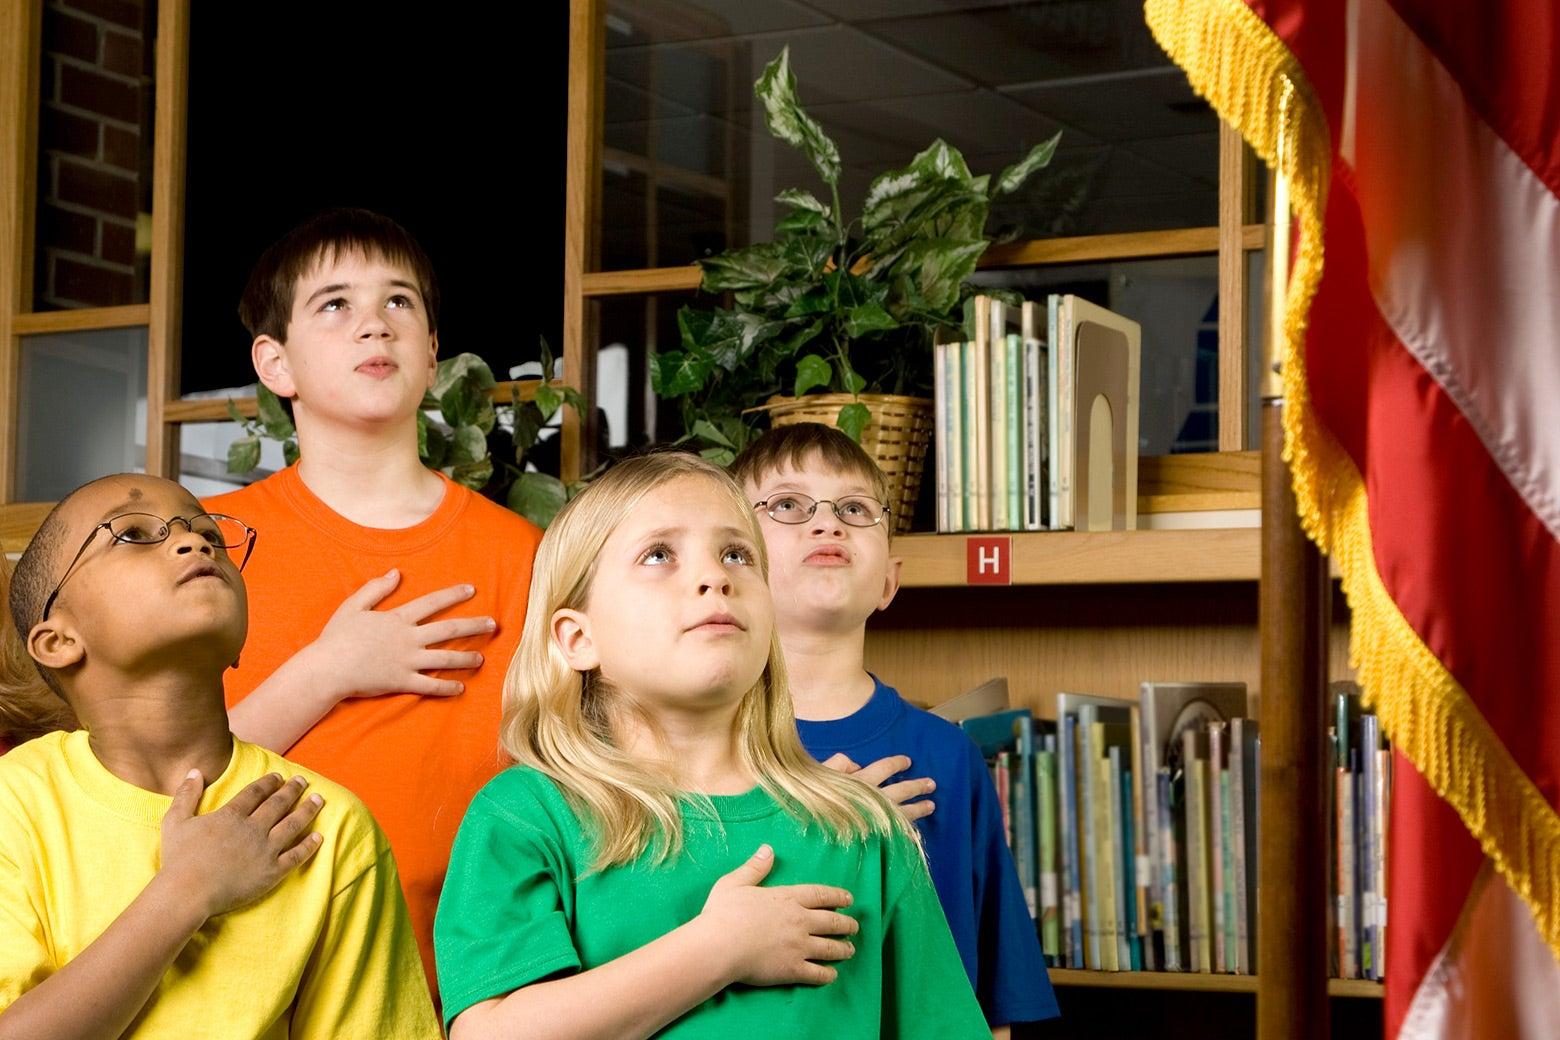 Children pledging allegiance to the United States flag